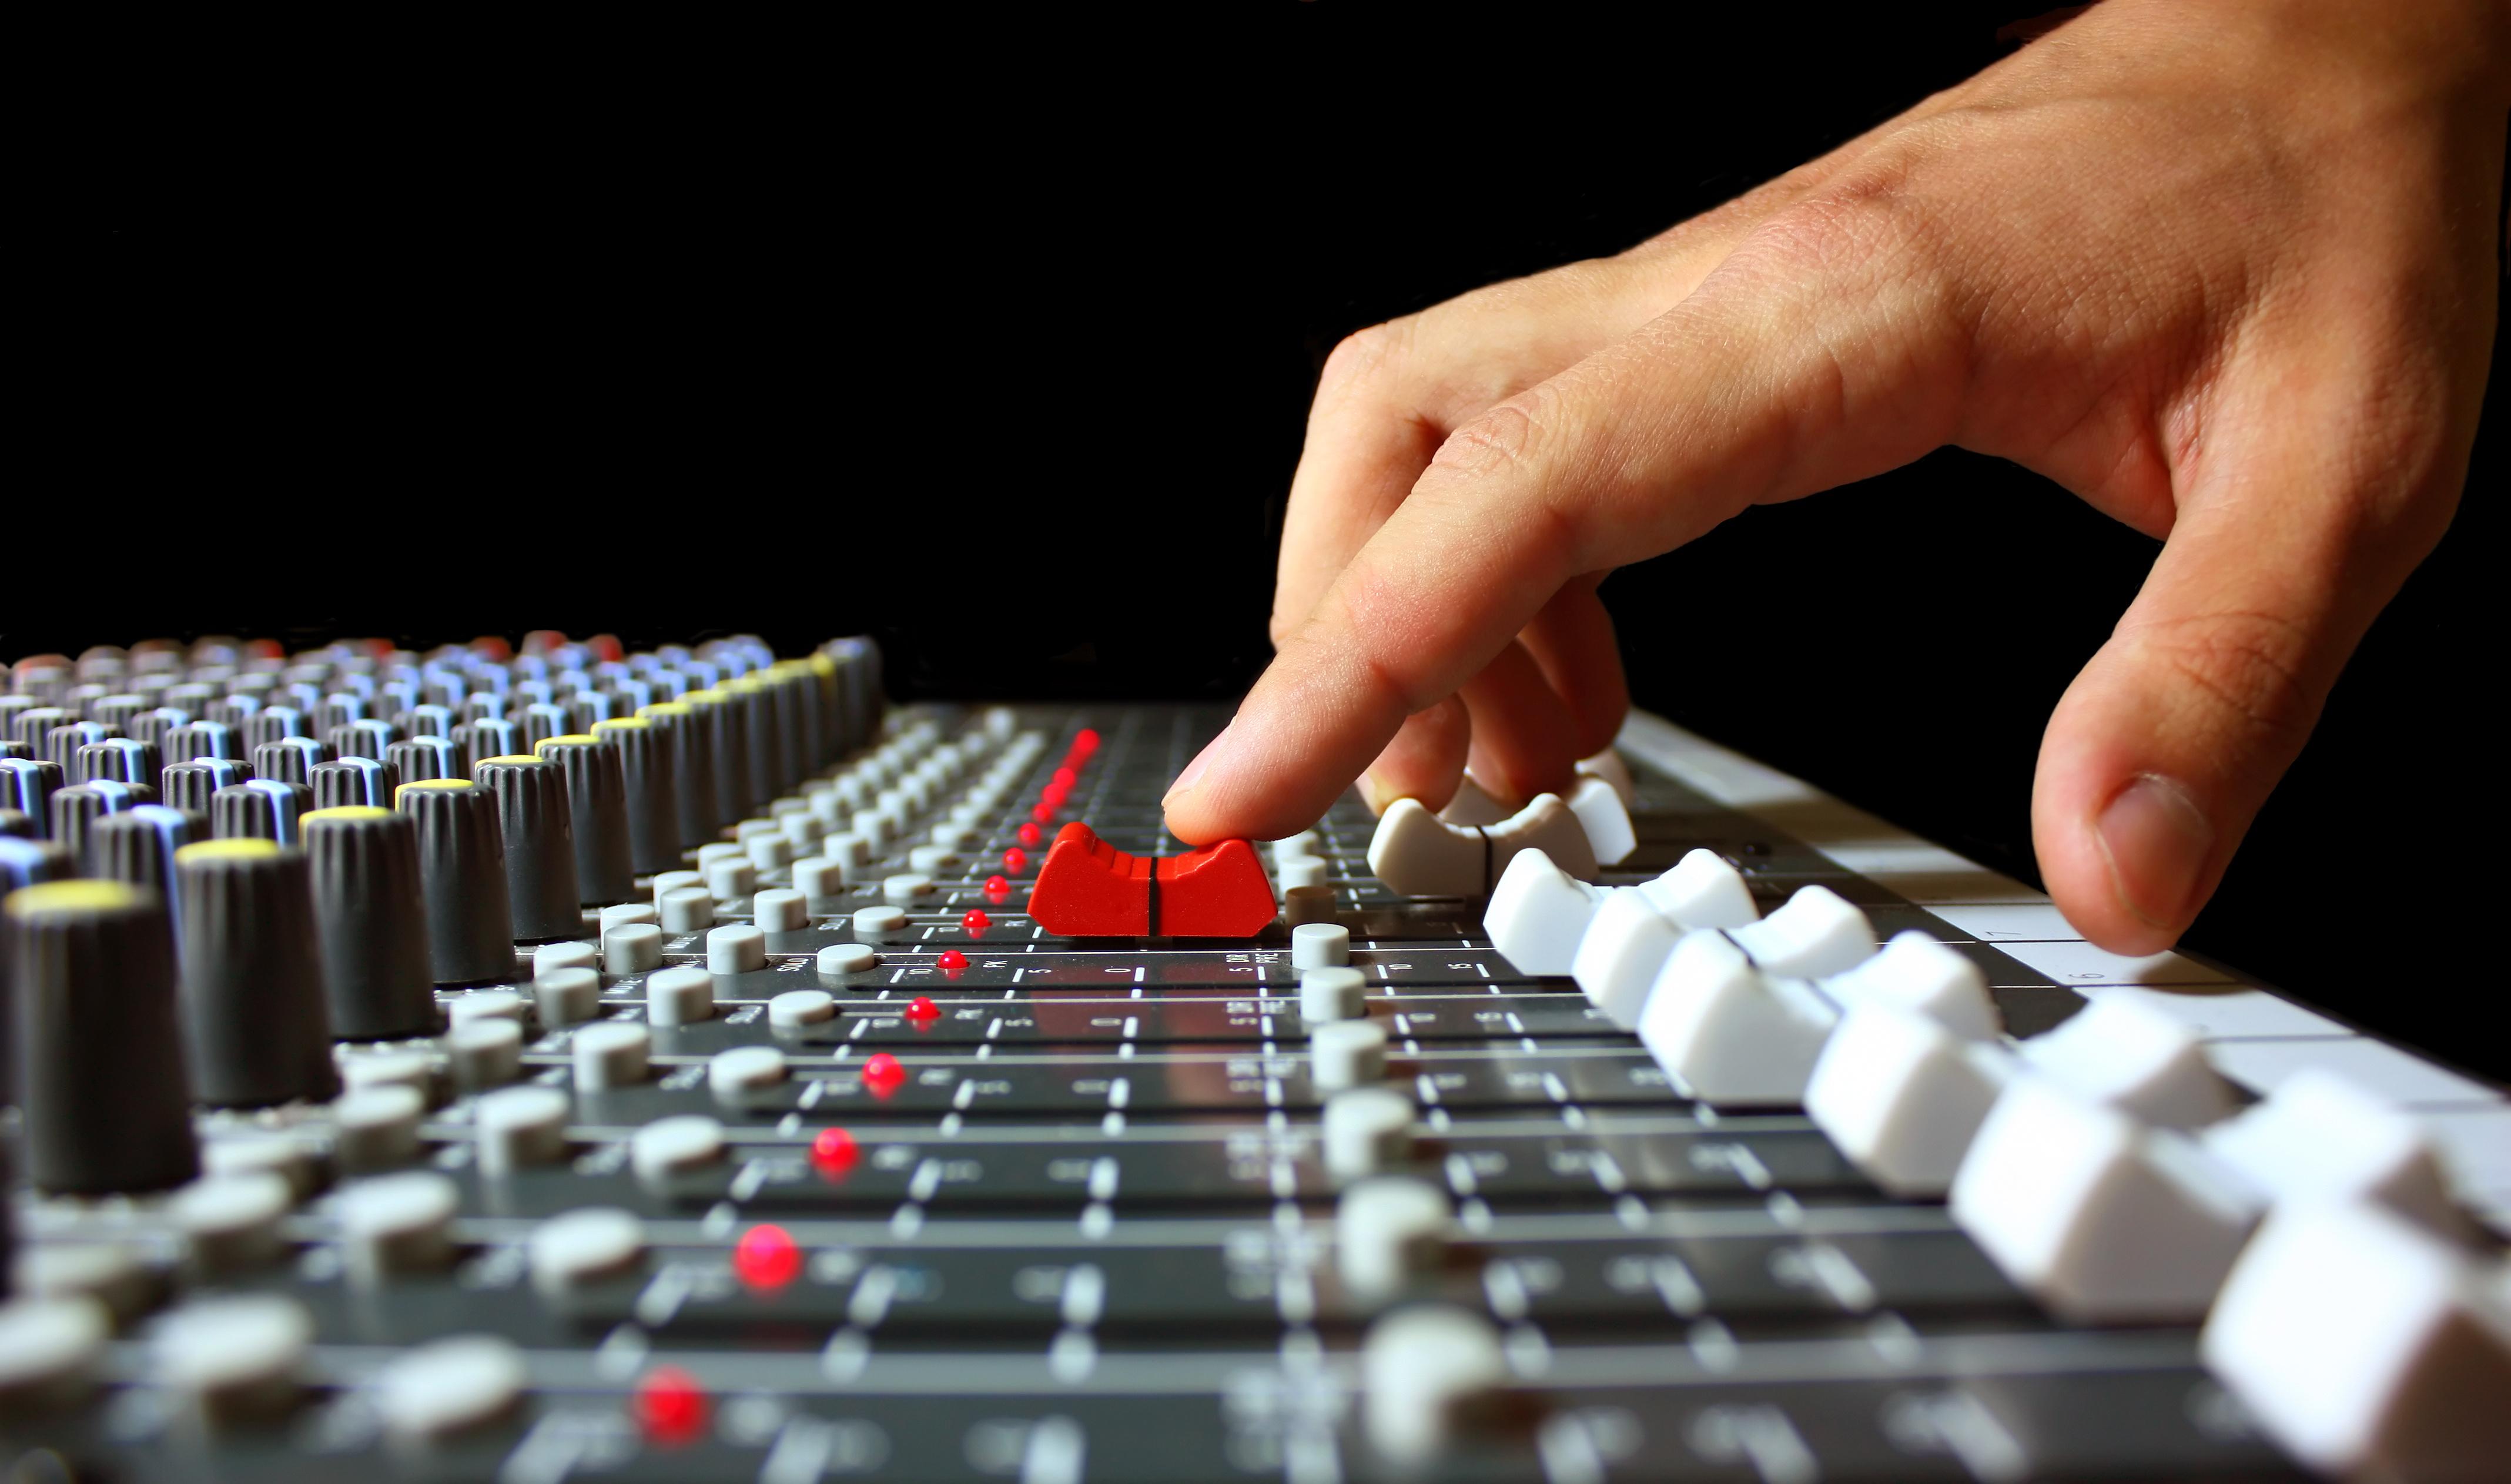 Advertising na radiju , saznajte kako kreirati text reklamne poruke pre snimanja